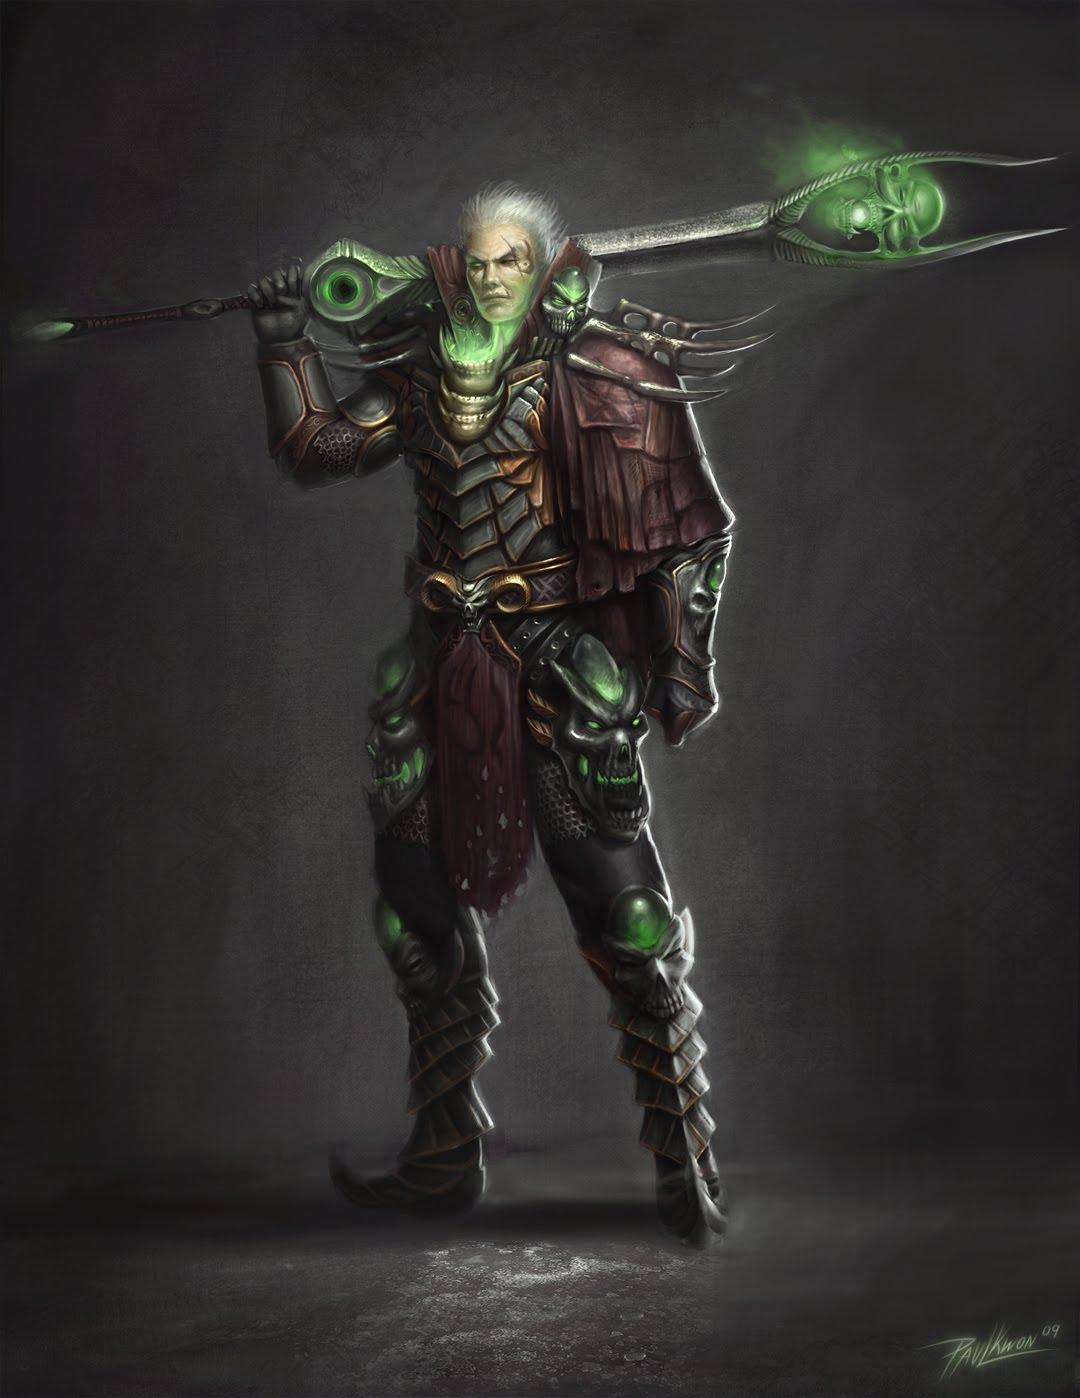 http://3.bp.blogspot.com/_DxlWwc8CpGc/S95ToH1mkjI/AAAAAAAAAbE/J87FwxlCoKk/s1600/Dark+Knight+copy.jpg